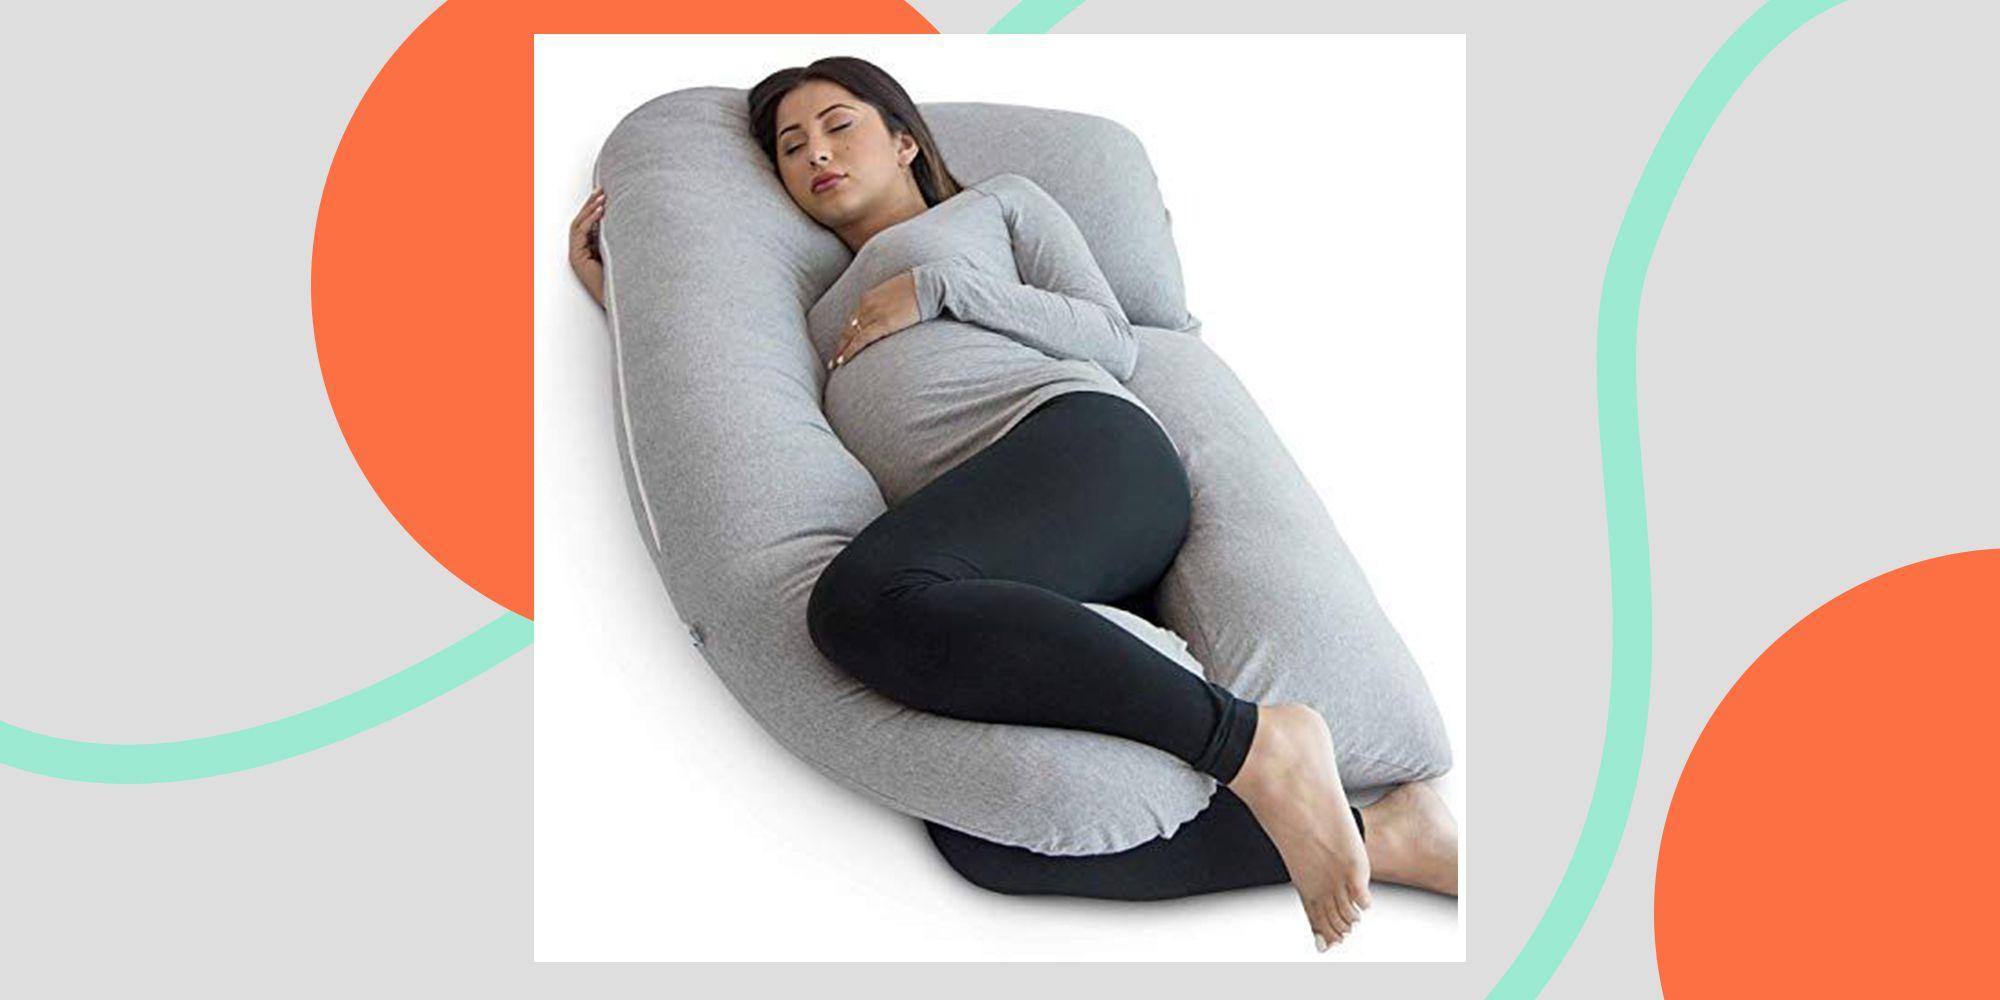 amazon s 1 pregnancy pillow has over 22k 5 ratings